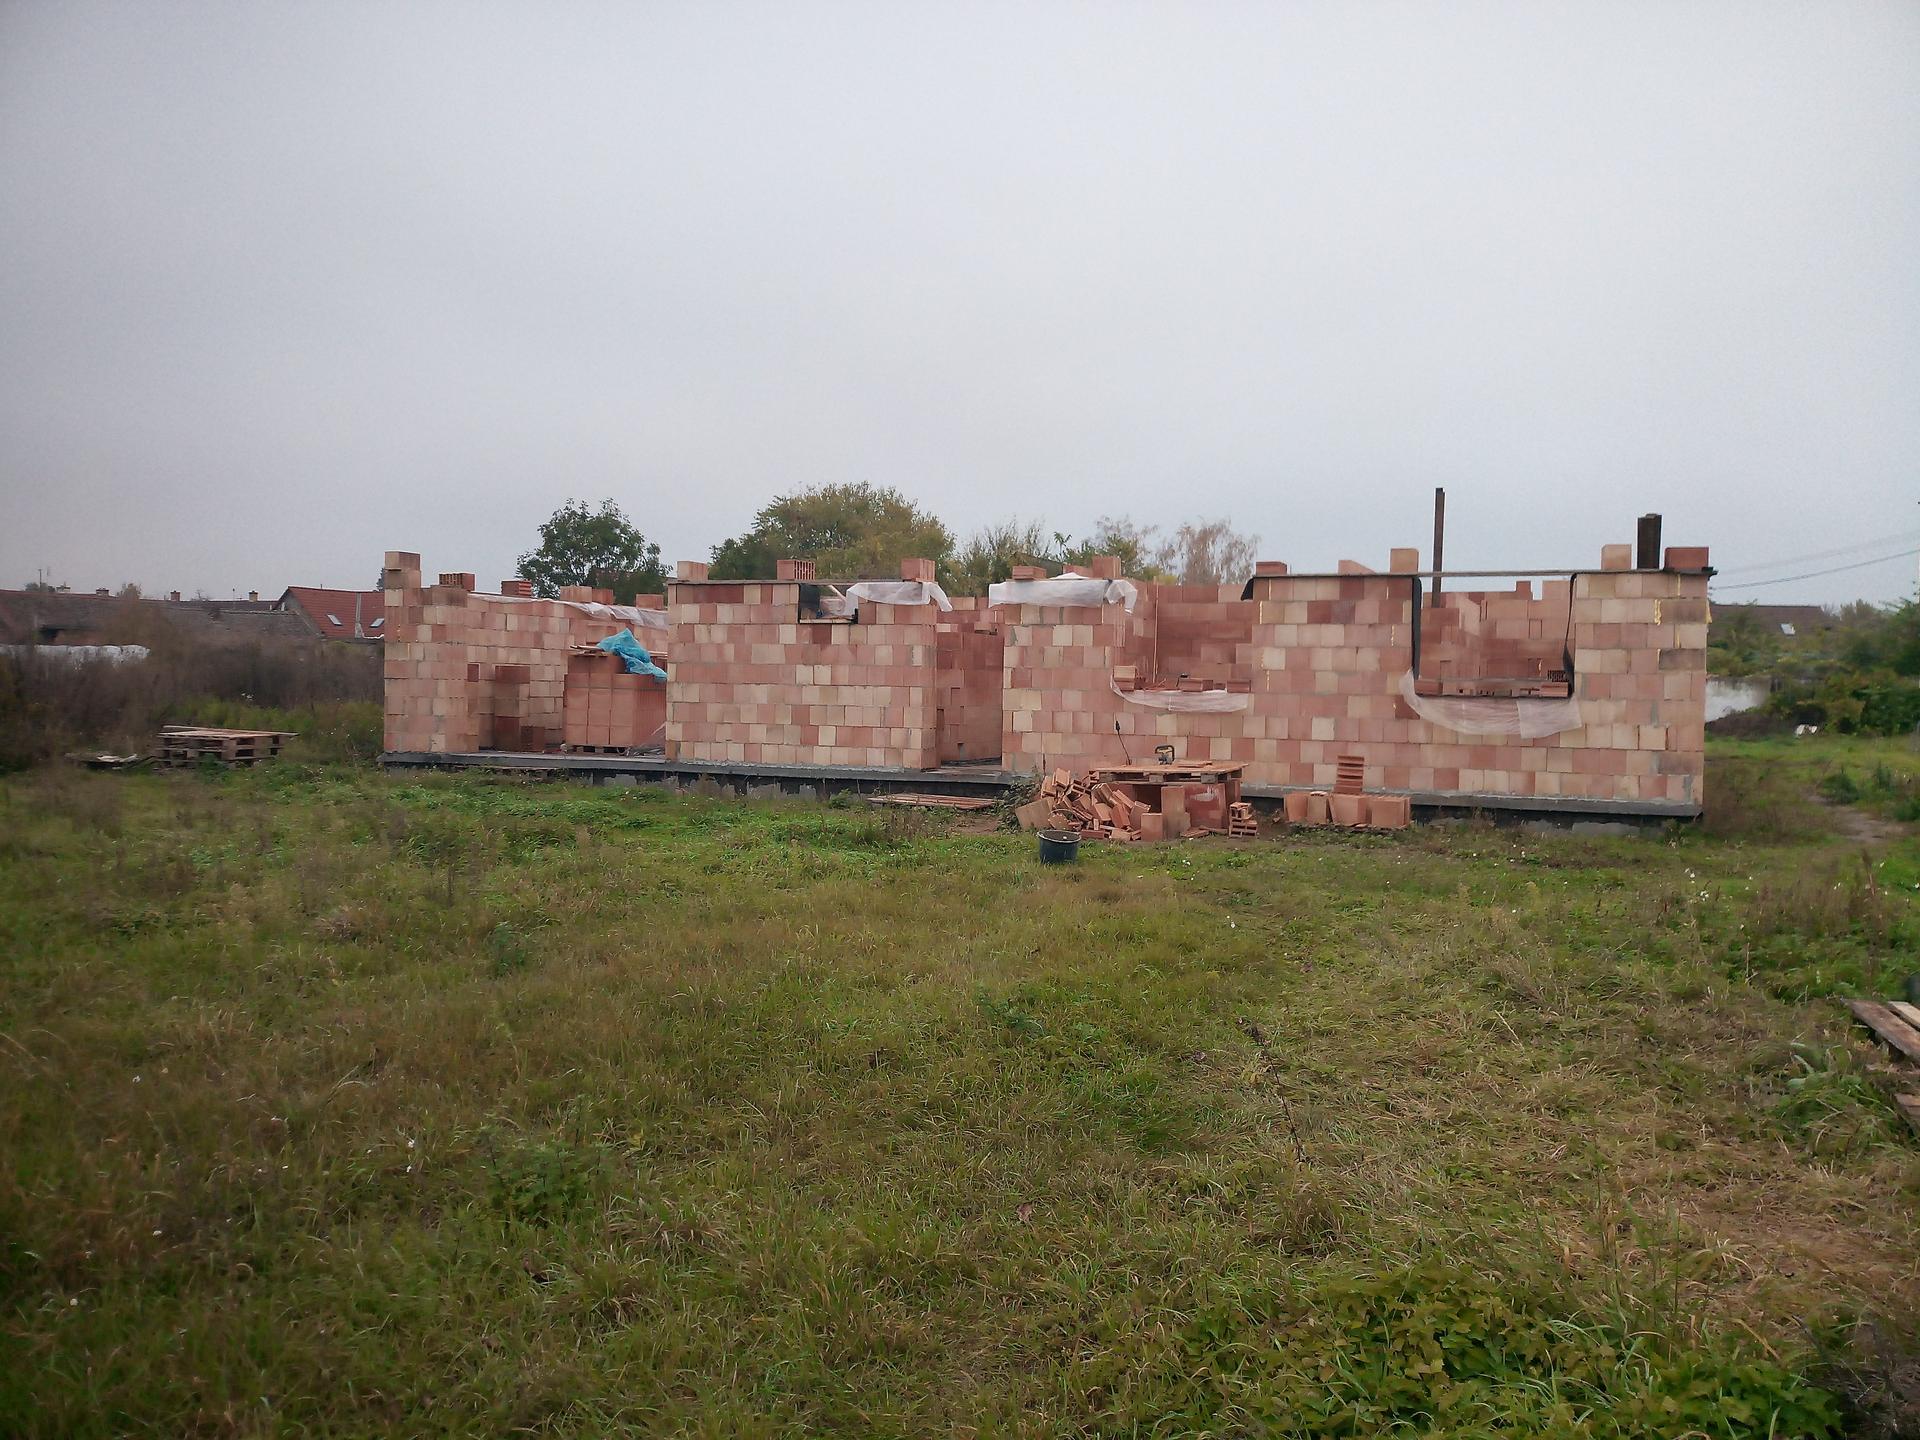 hrubá stavba - Obrázek č. 36